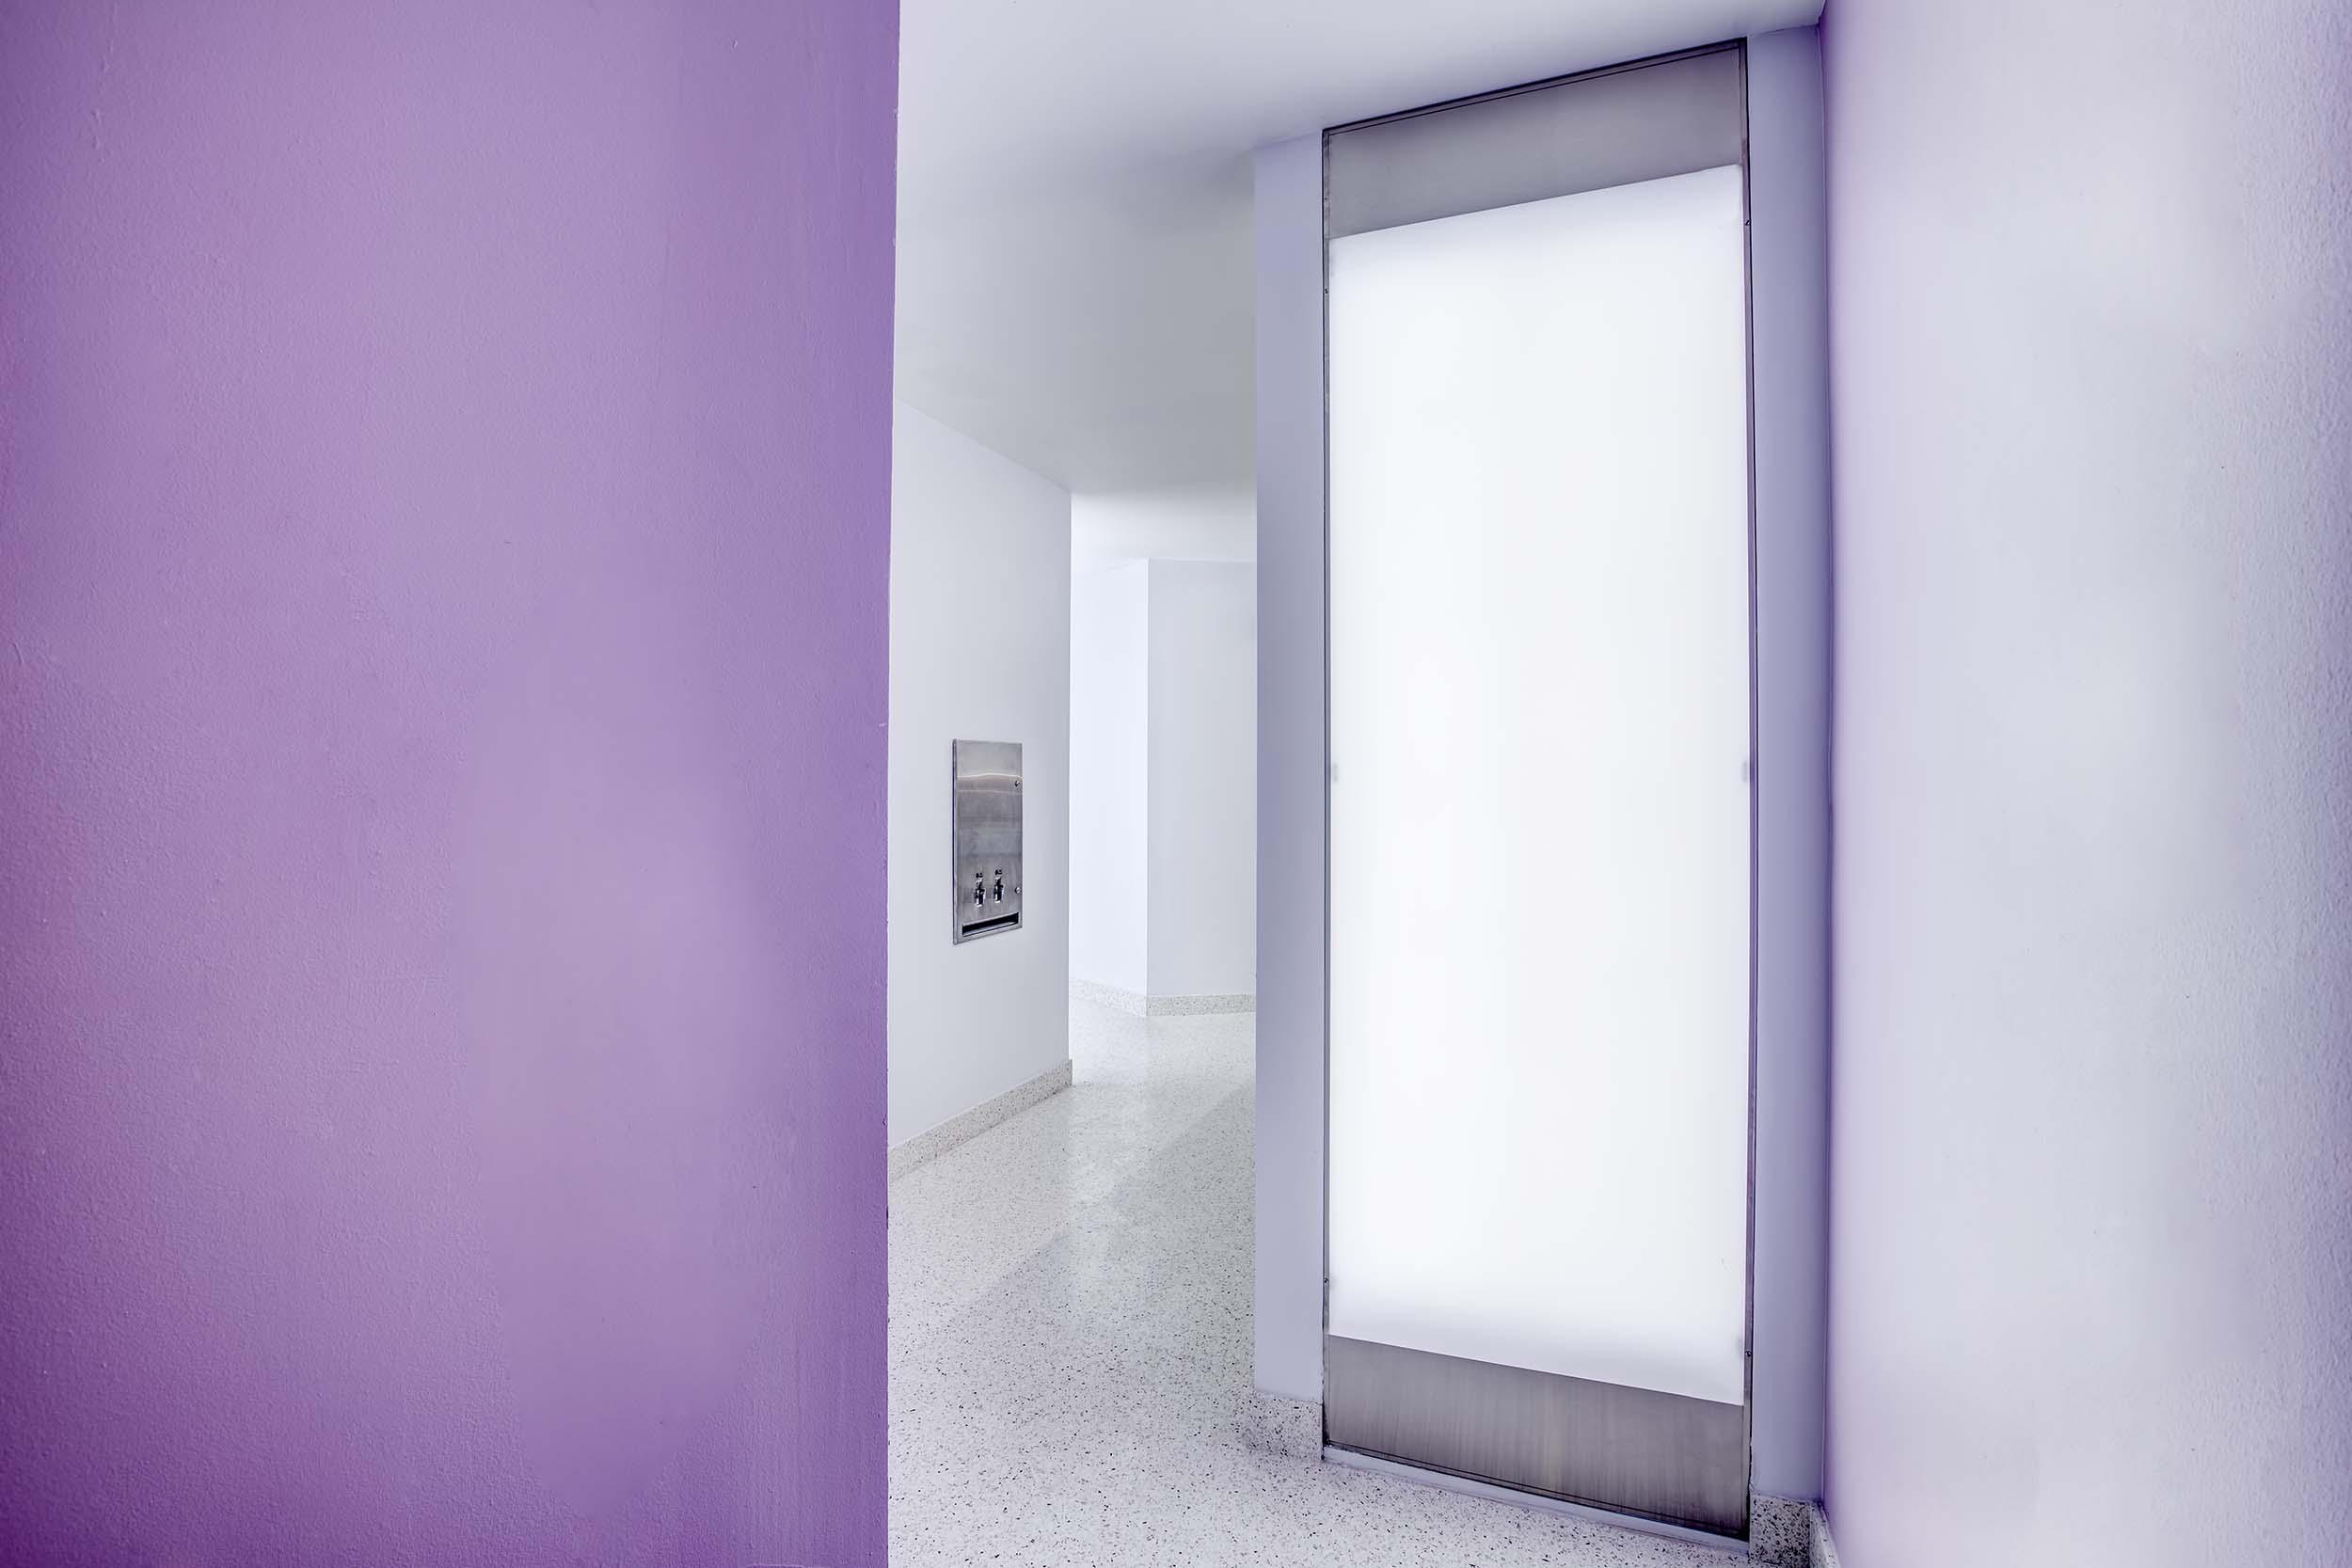 Solstice_Architects_Van_Wezel_04.jpg